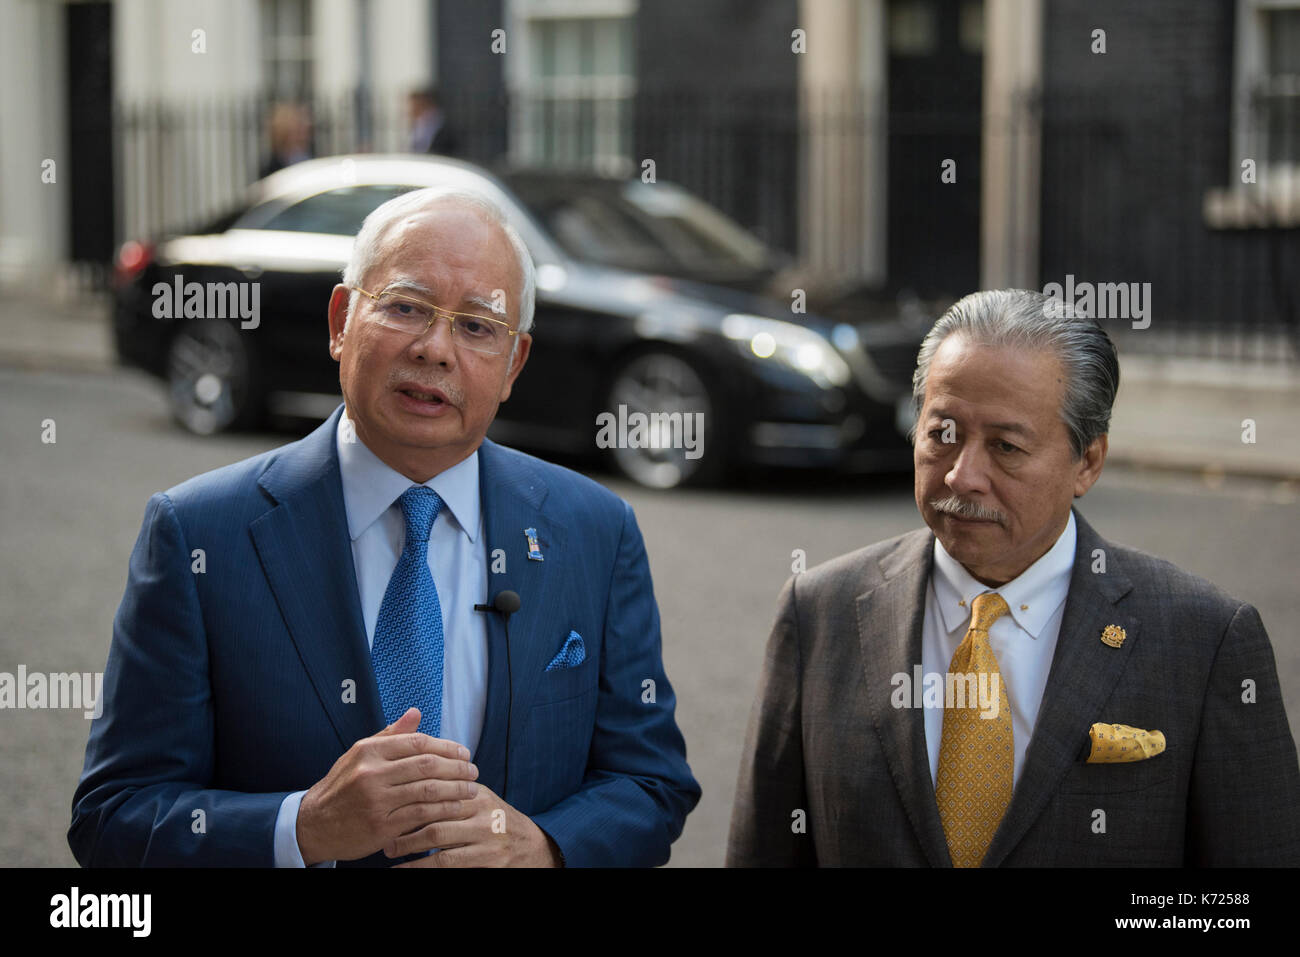 London, UK. 14th Sep, 2017. Prime Minister Najib Razak of Malaysia, alongside the Malaysian Foreign Minister Anifah - Stock Image